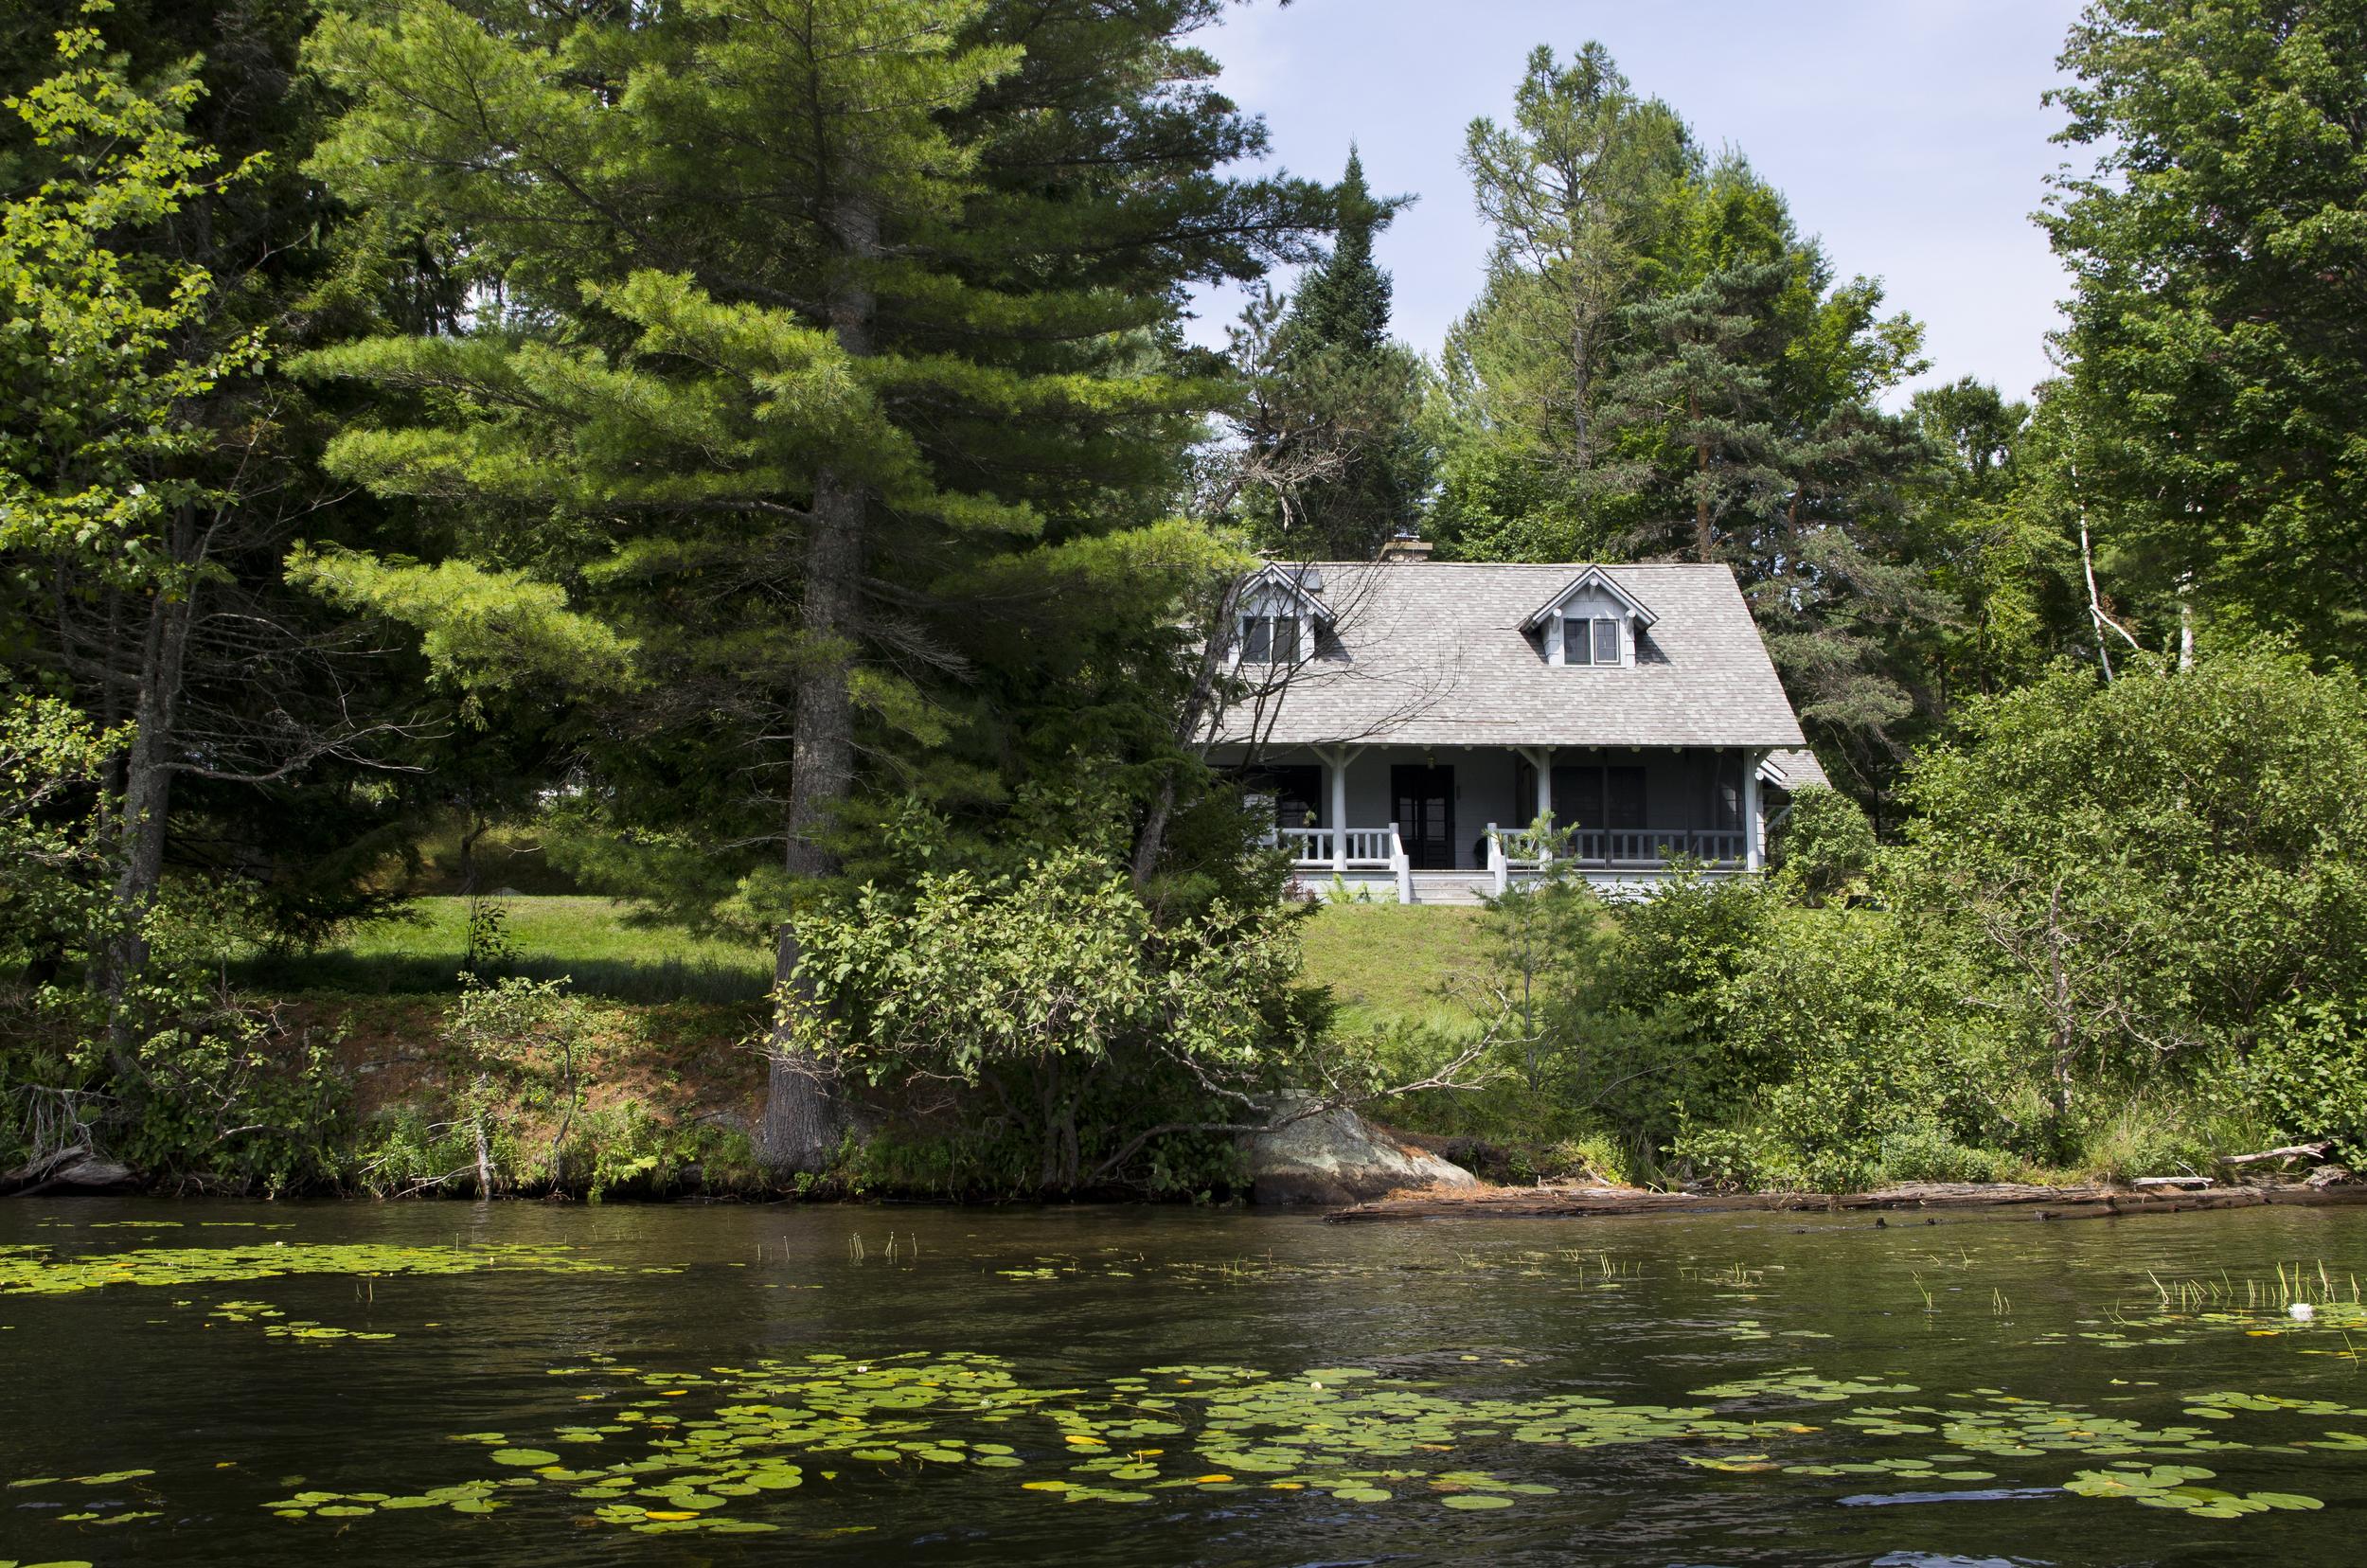 Grey Cottage, Summer 2014